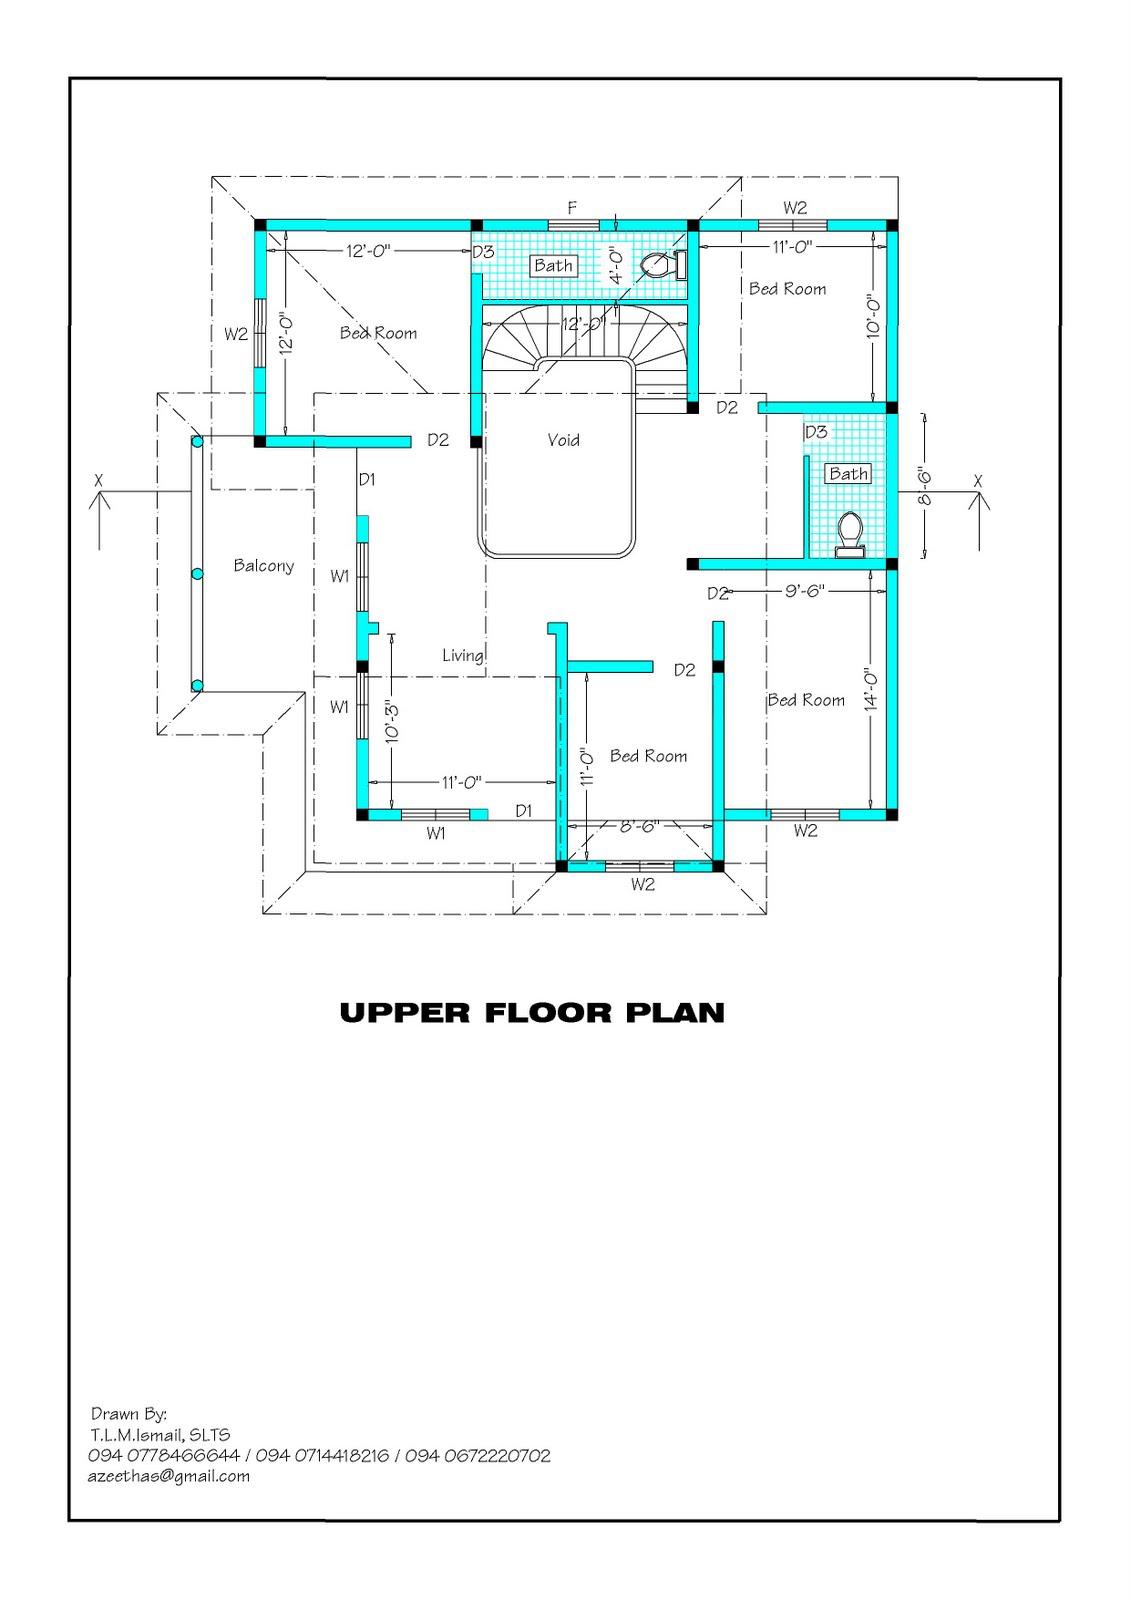 house plan house plans in sri lanka sri lankan house plan designs on diagram for wiring a 3 bedroom house [ 1131 x 1600 Pixel ]